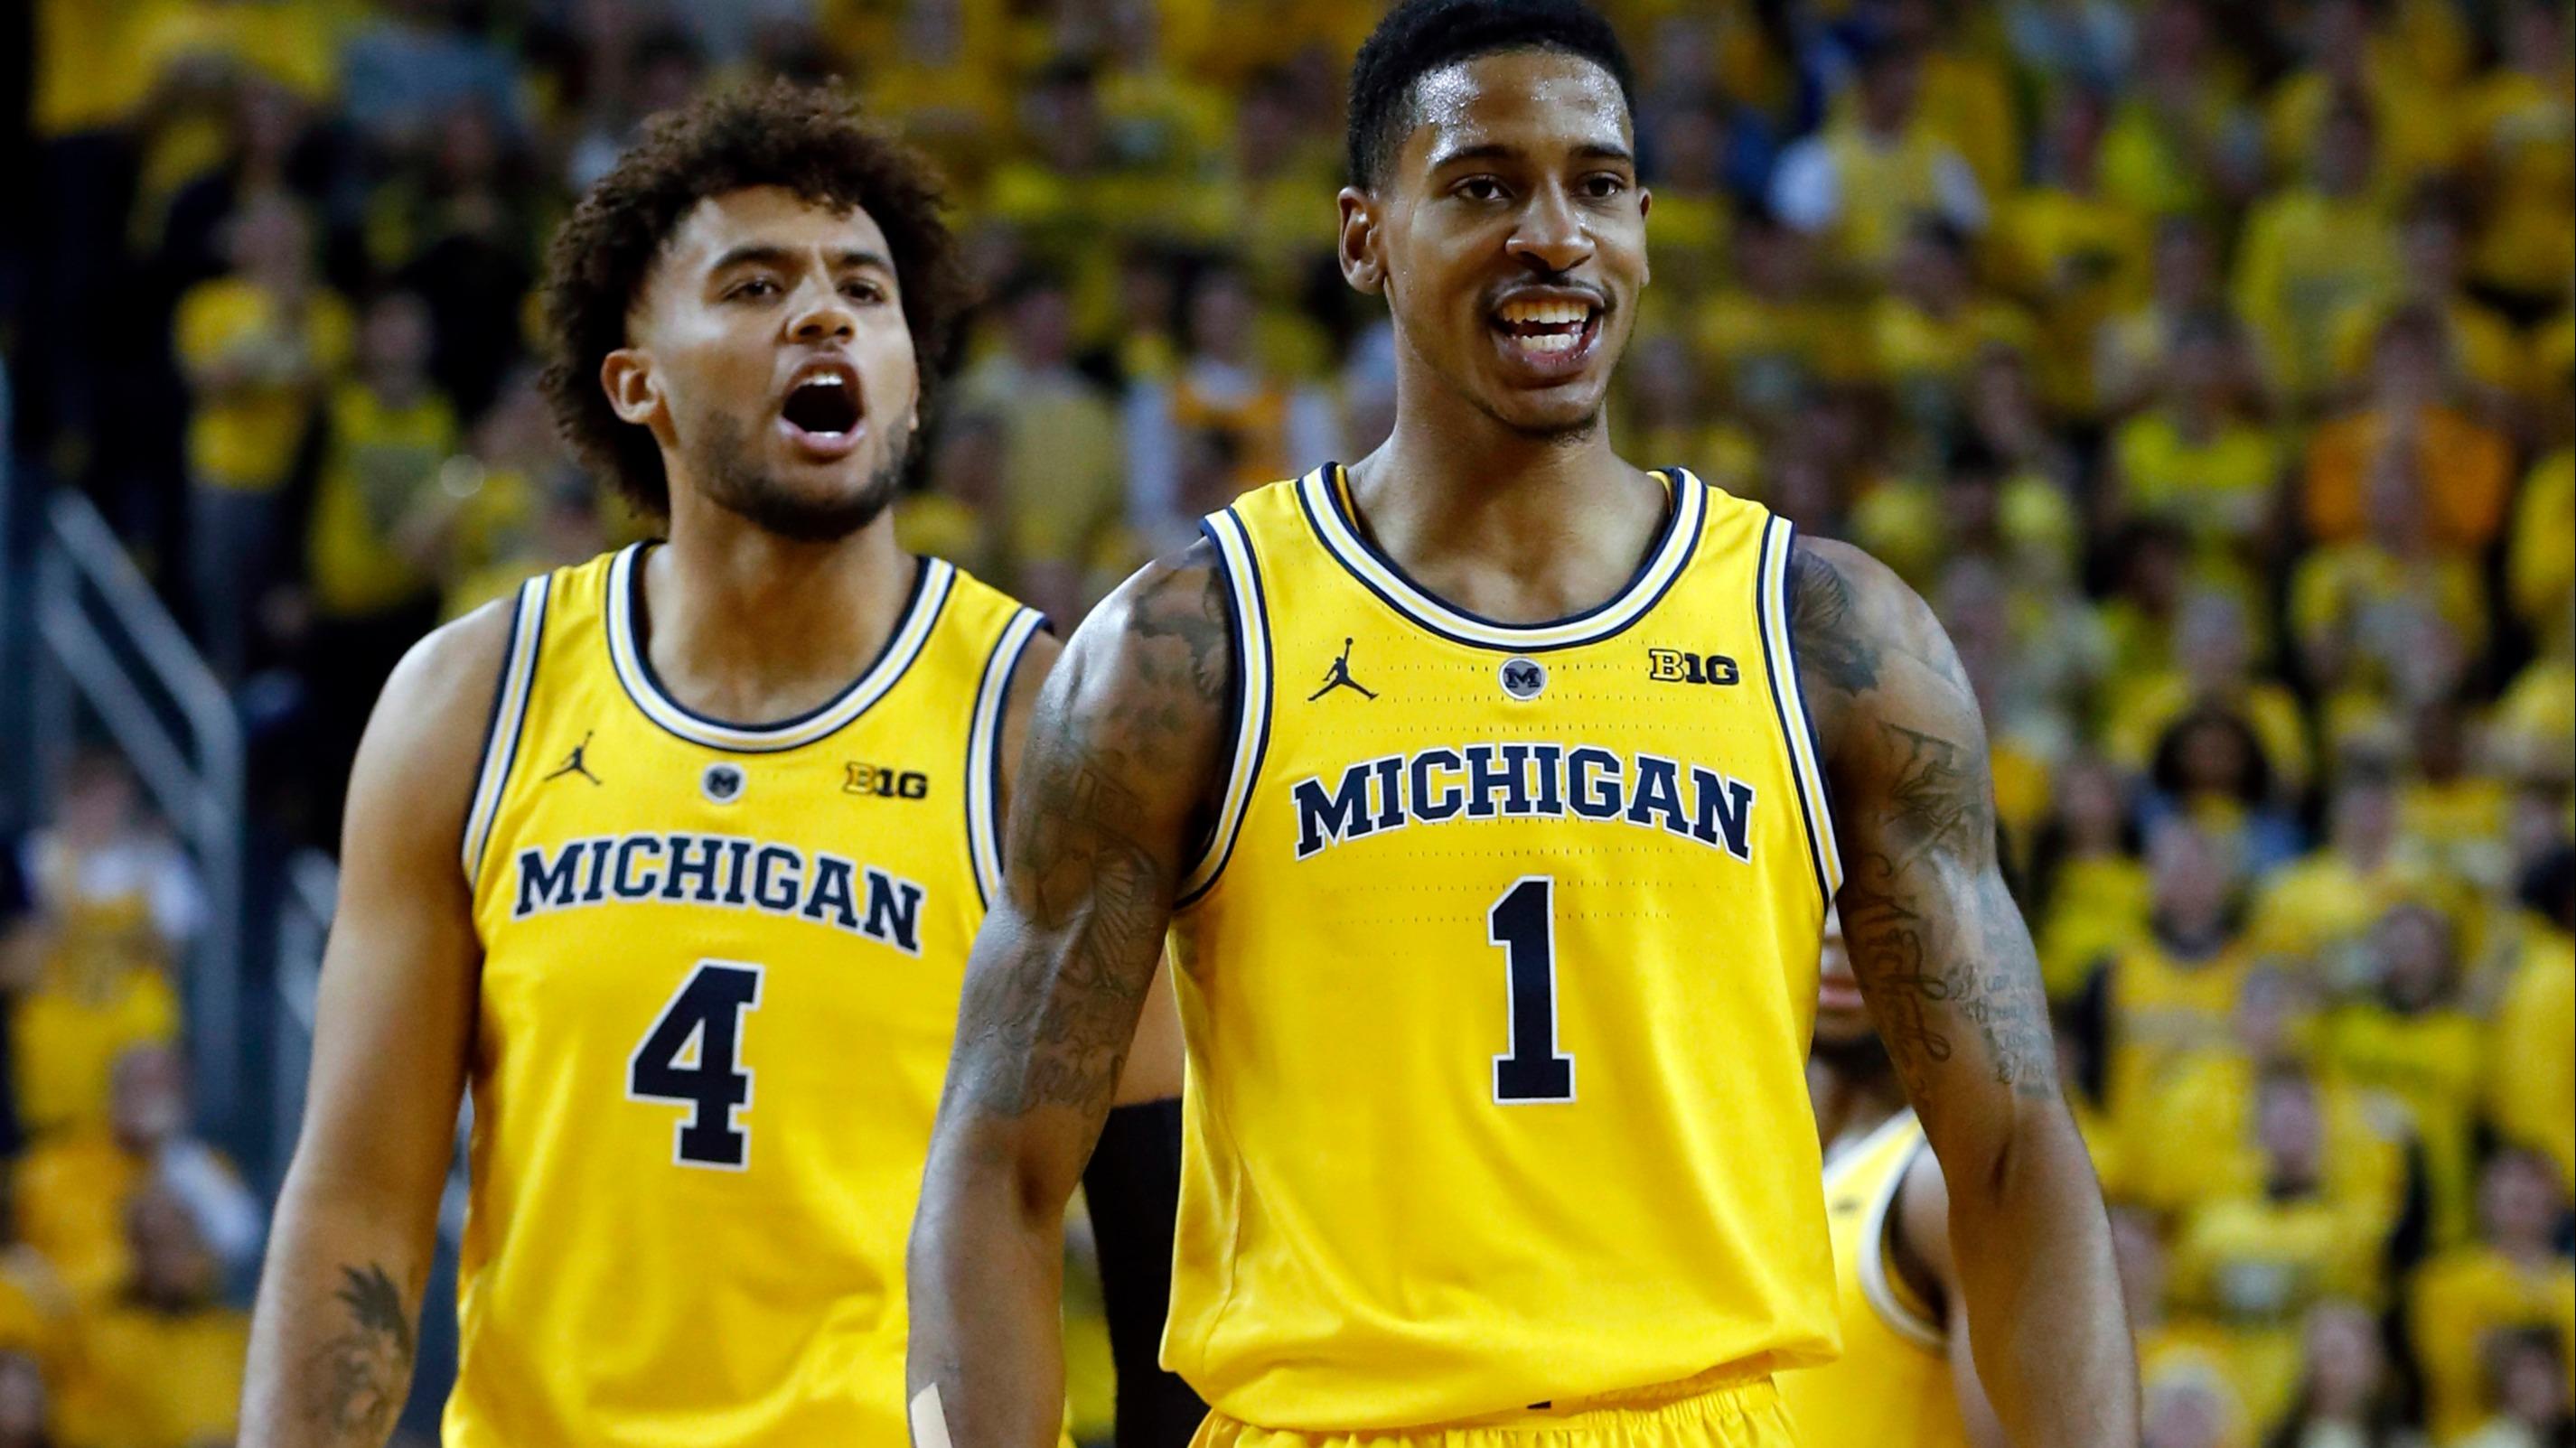 NCAA Tournament 2019 odds: Michigan takes big futures leap